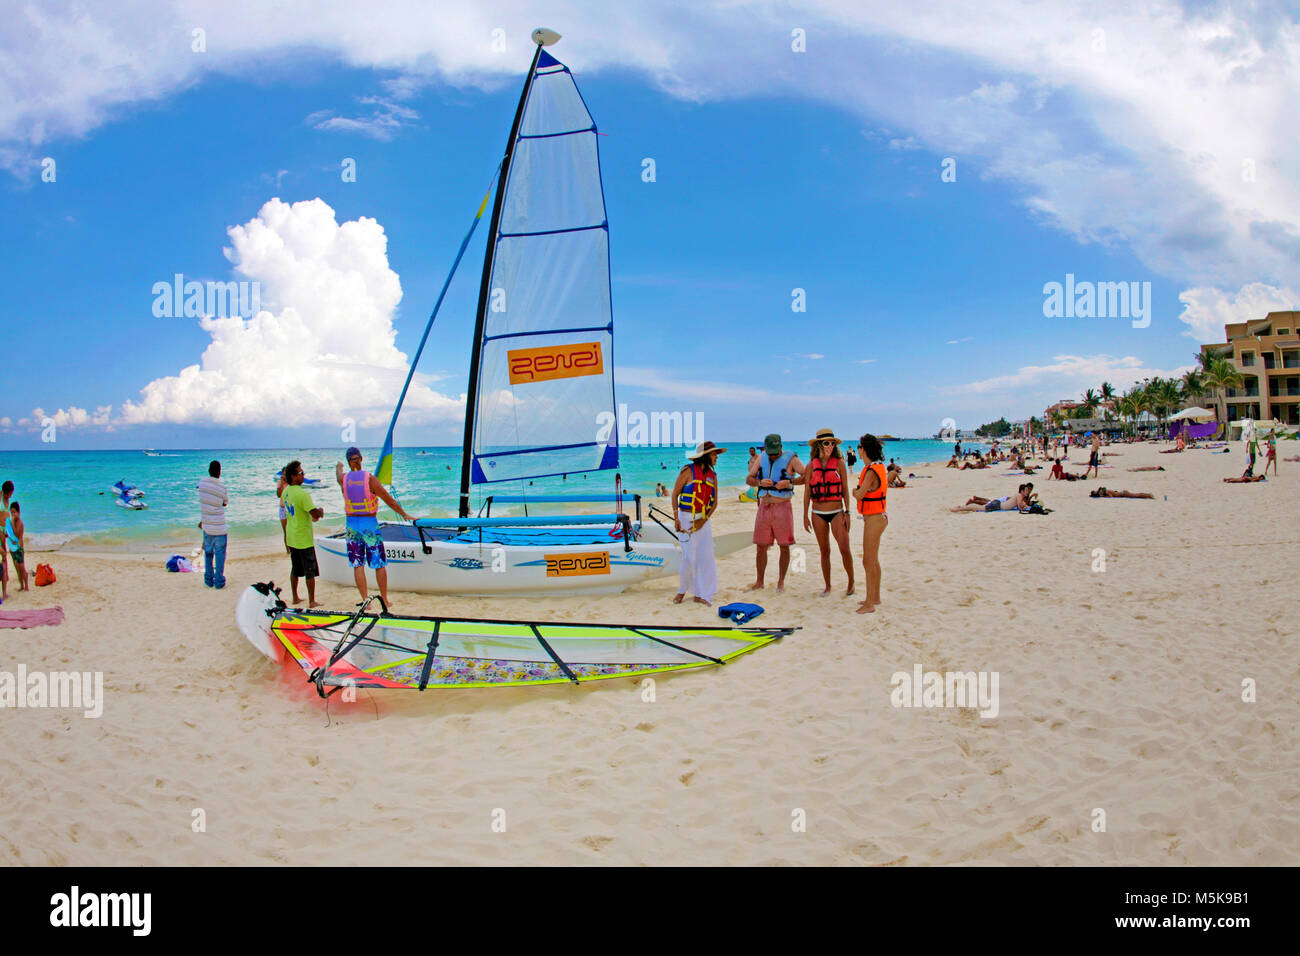 Wassersport am Strand von Playa del Carmen, Mexiko, Karibik | Wassersport am Strand von Playa del Carmen, Mexiko, Stockbild